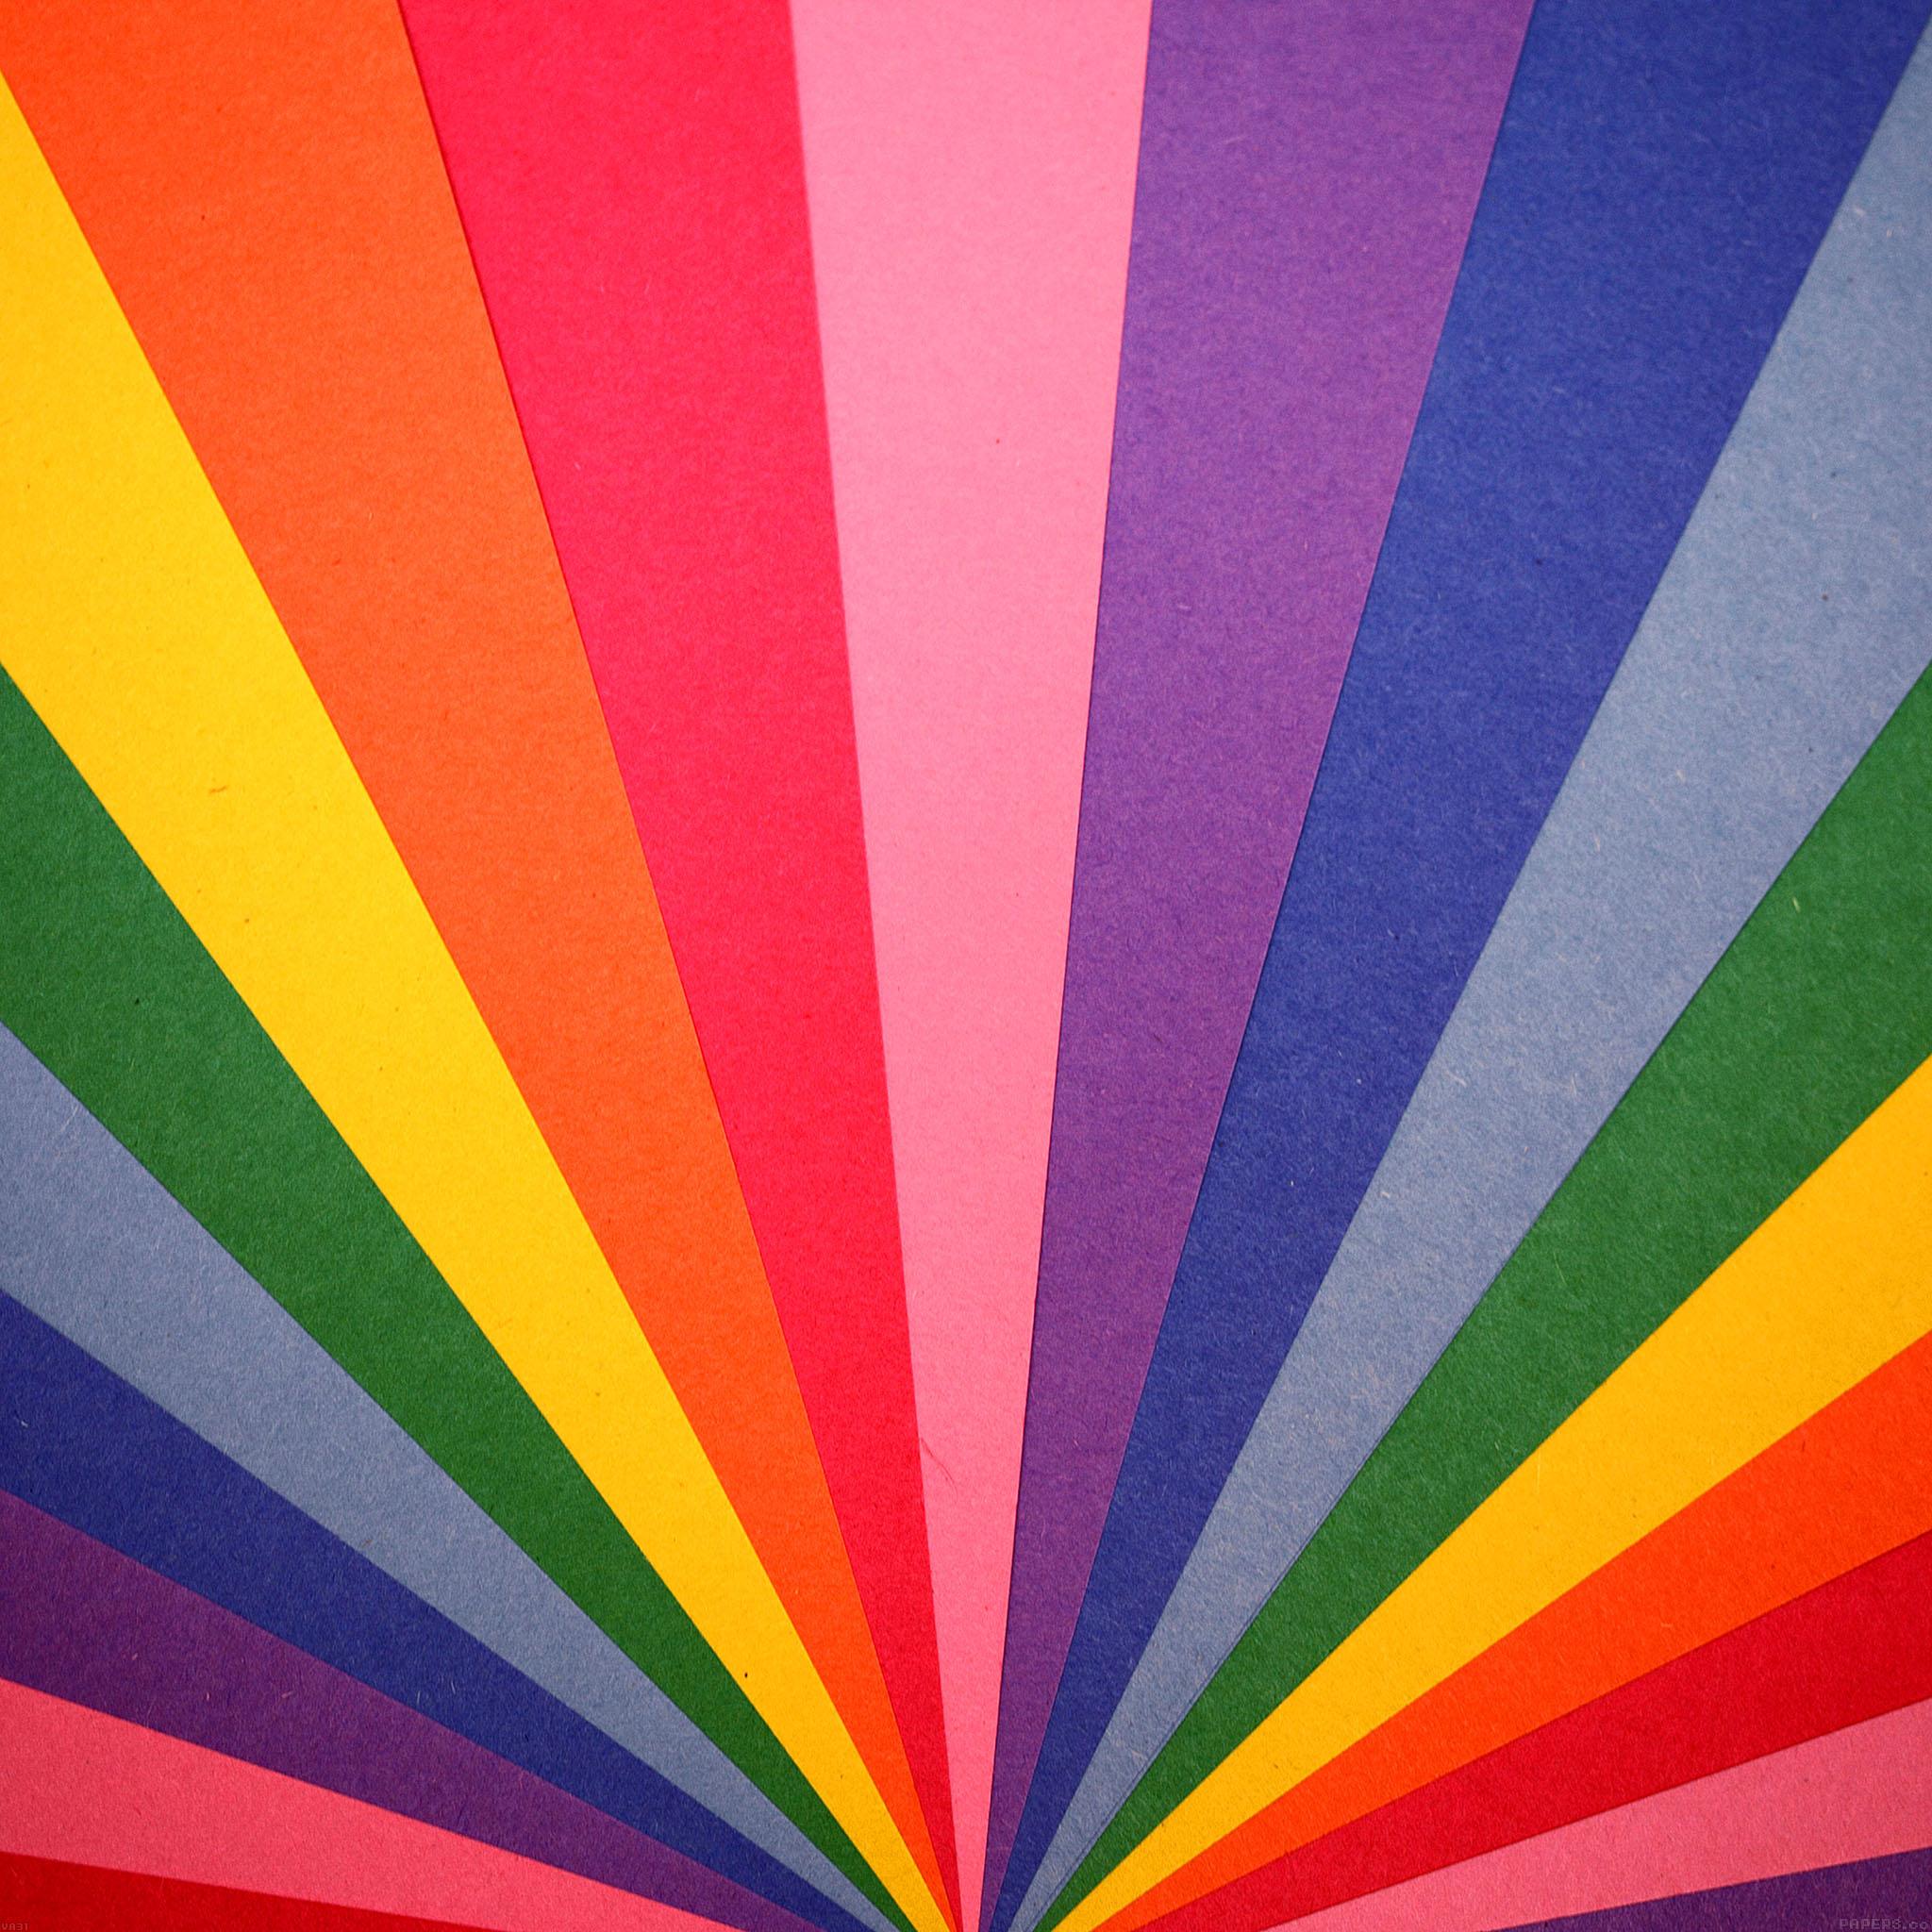 Iphone X Parallax Wallpaper Batman Va31 Rainbow Light Pattern Papers Co